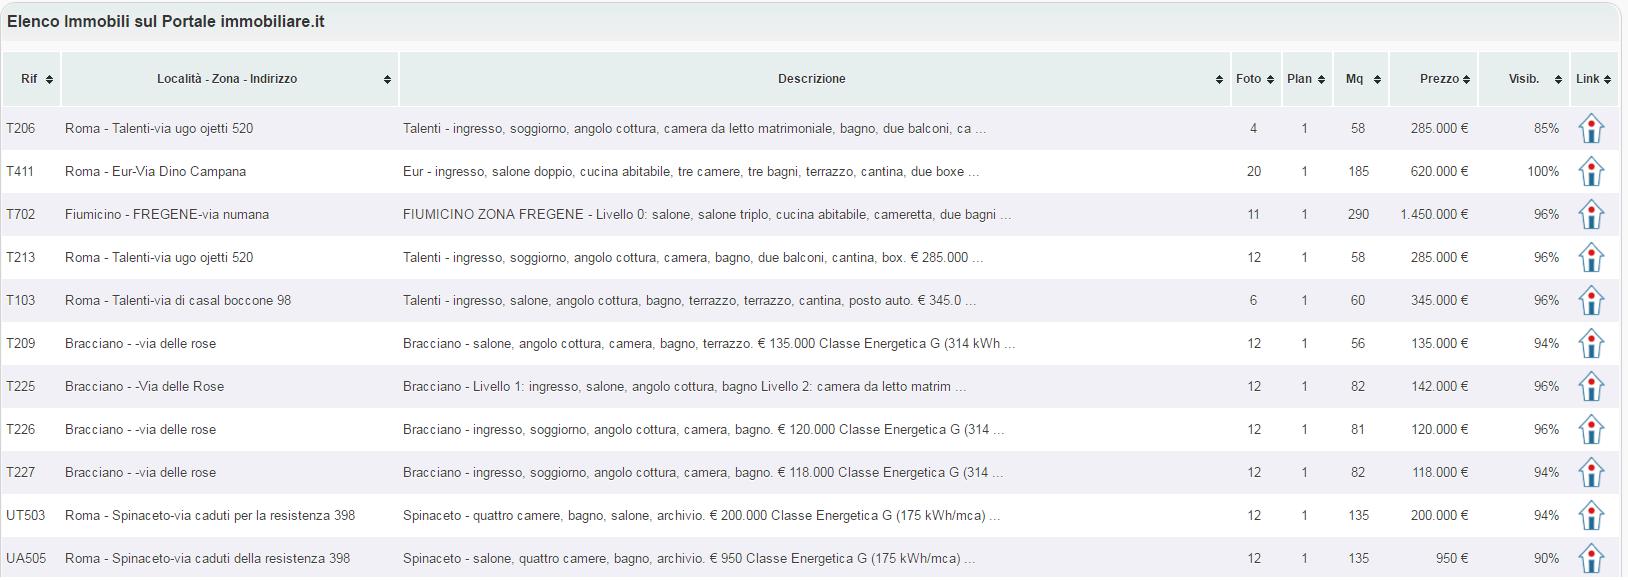 elenco_portale